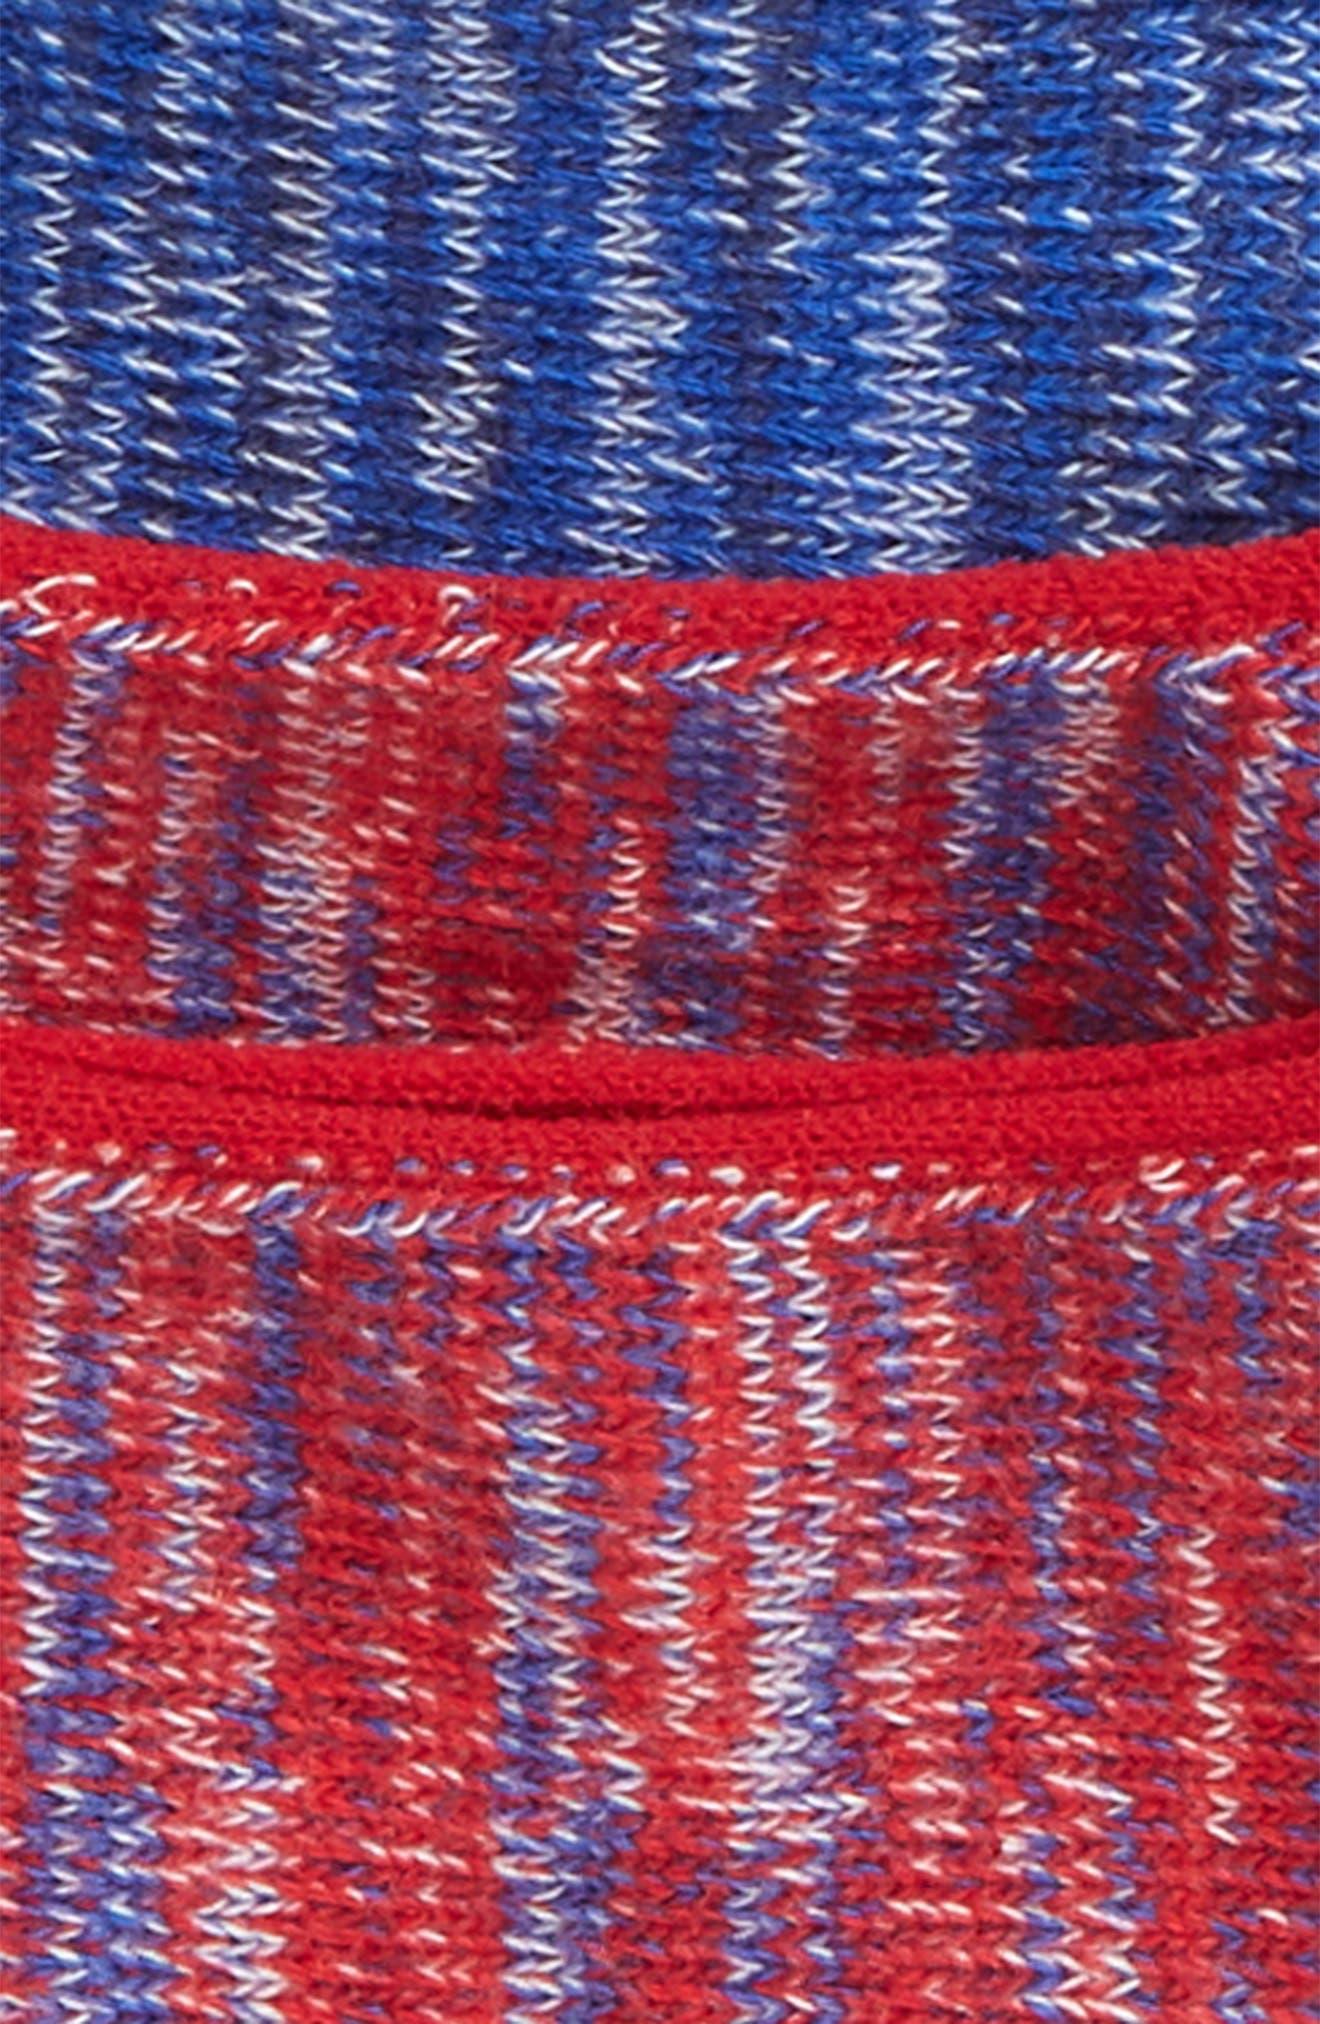 2-Pack Marl Loafer Liner Socks,                             Alternate thumbnail 2, color,                             RED MARL/ NAVY MARL